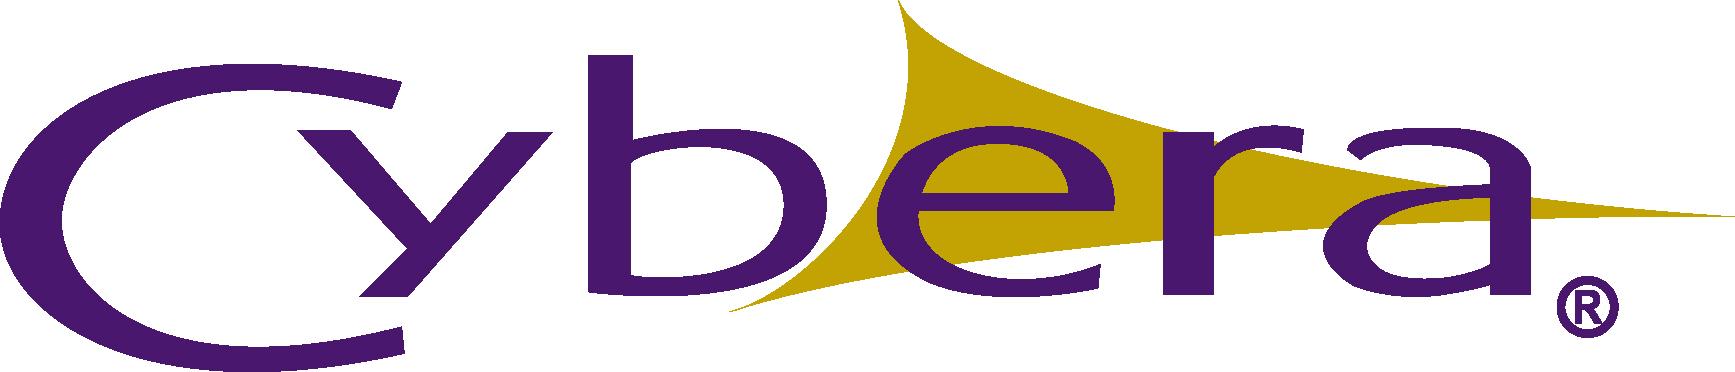 Cybera_logo